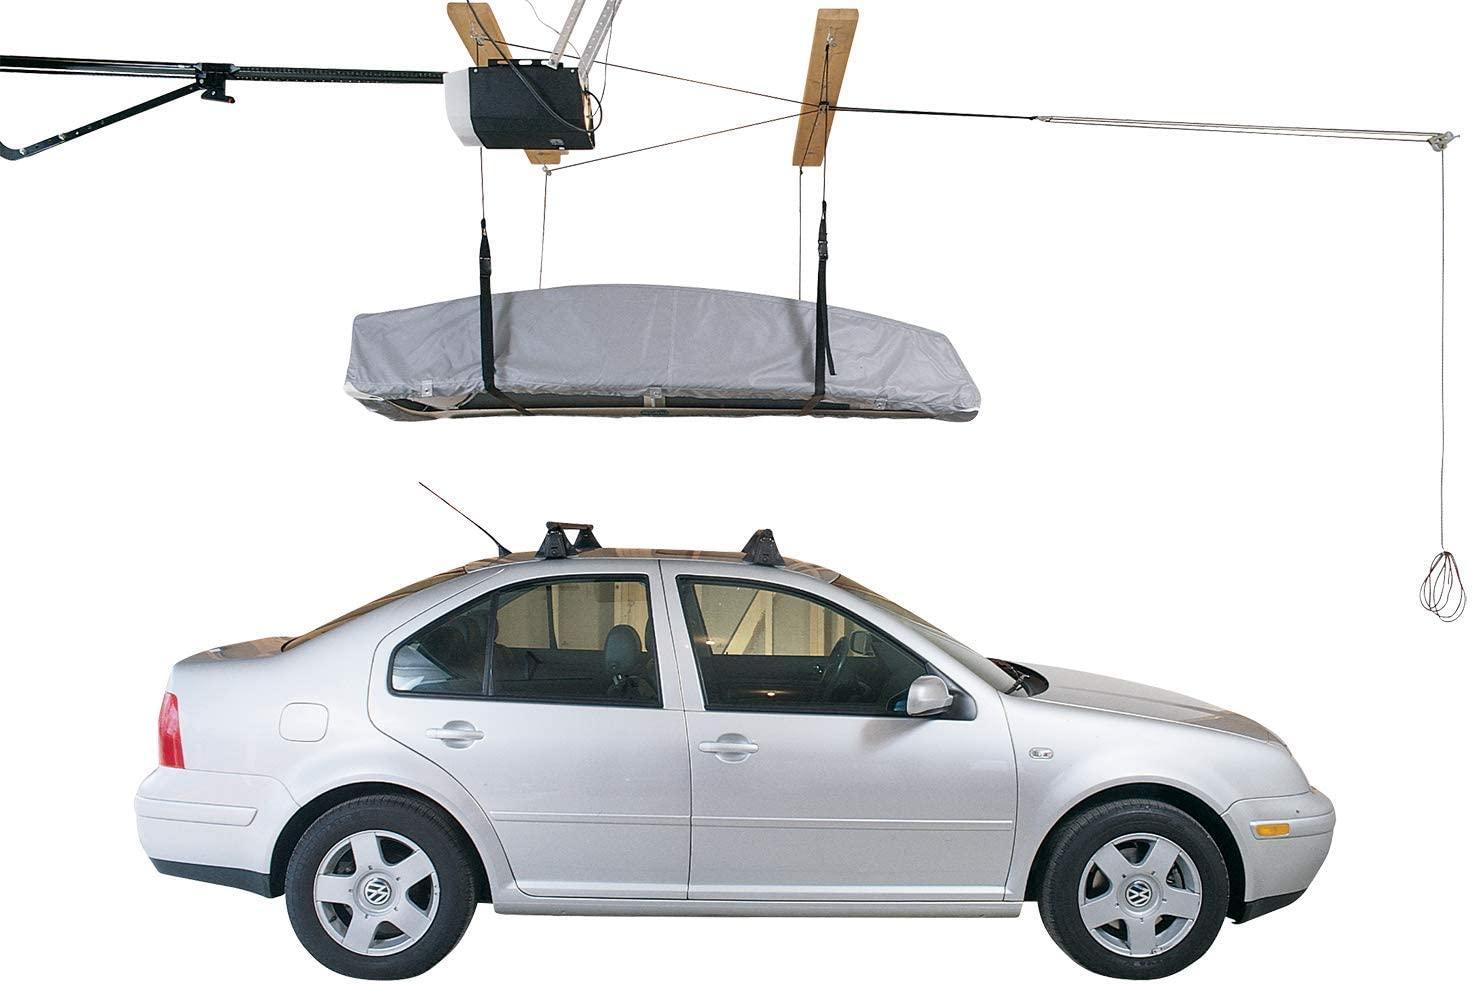 HARKEN Cargo Box Hoist   Overhead Garage Storage, Lifts Load Evenly, Safe Anti-Drop System, 4:1 Mechanical Advantage, Smart Garage Organization